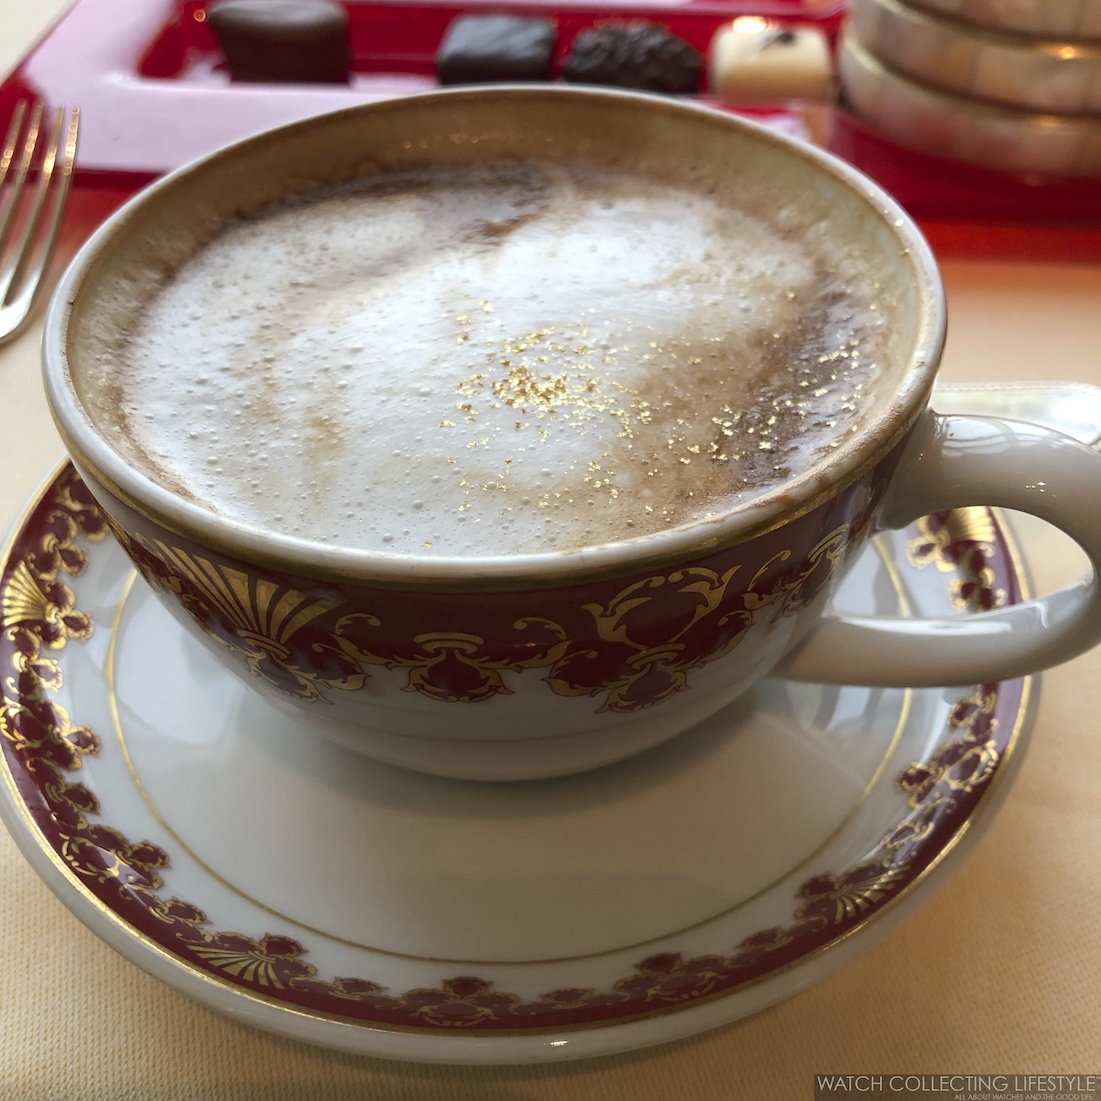 Cappuccino with gold flakes at Burj Al Arab